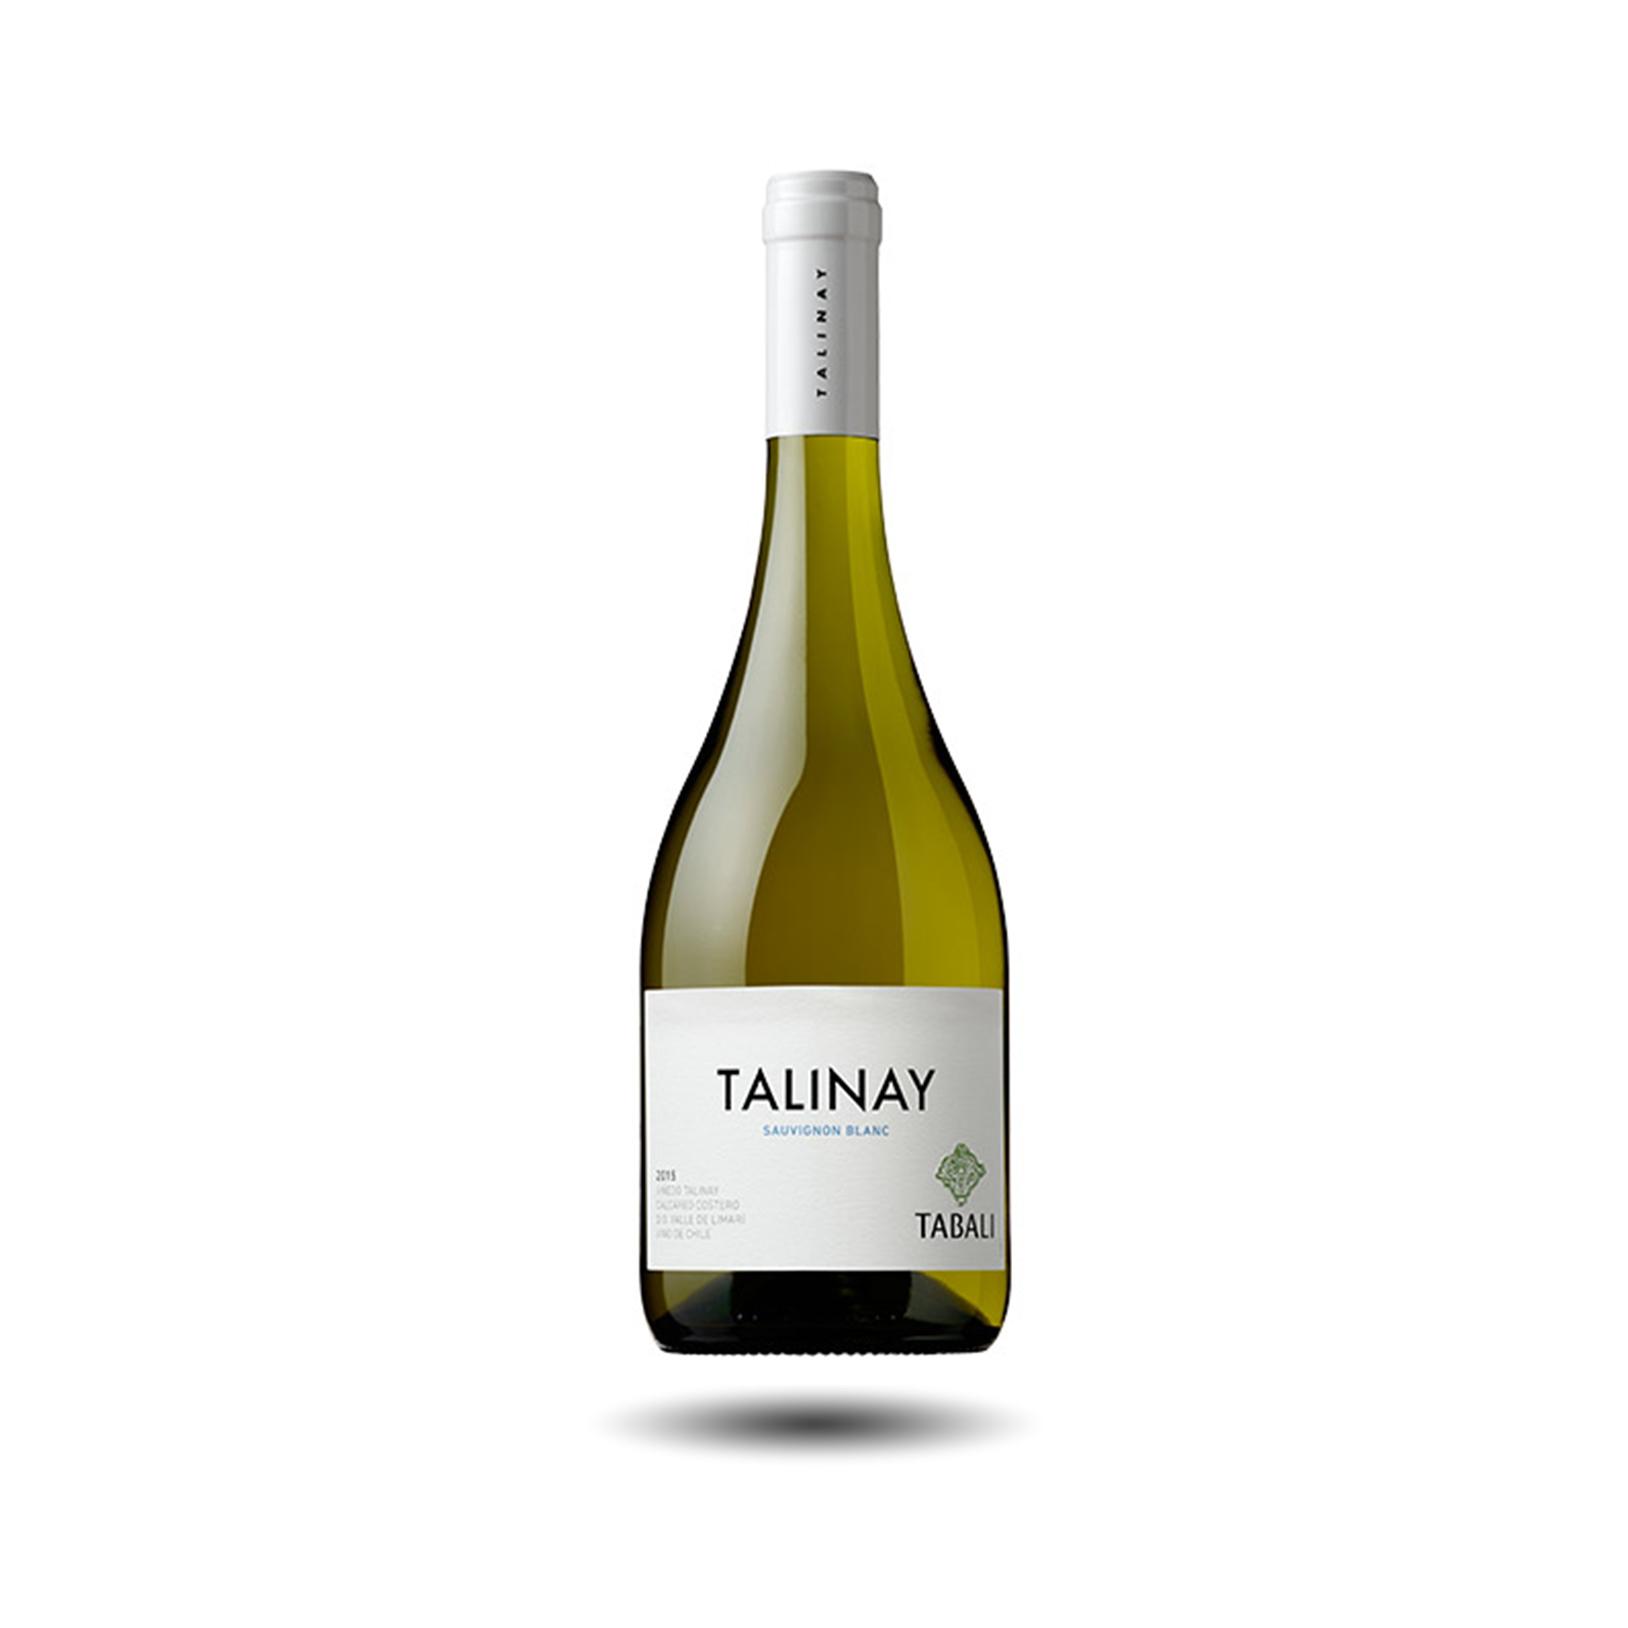 Tabali - Talinay, Sauvignon Blanc, 2020